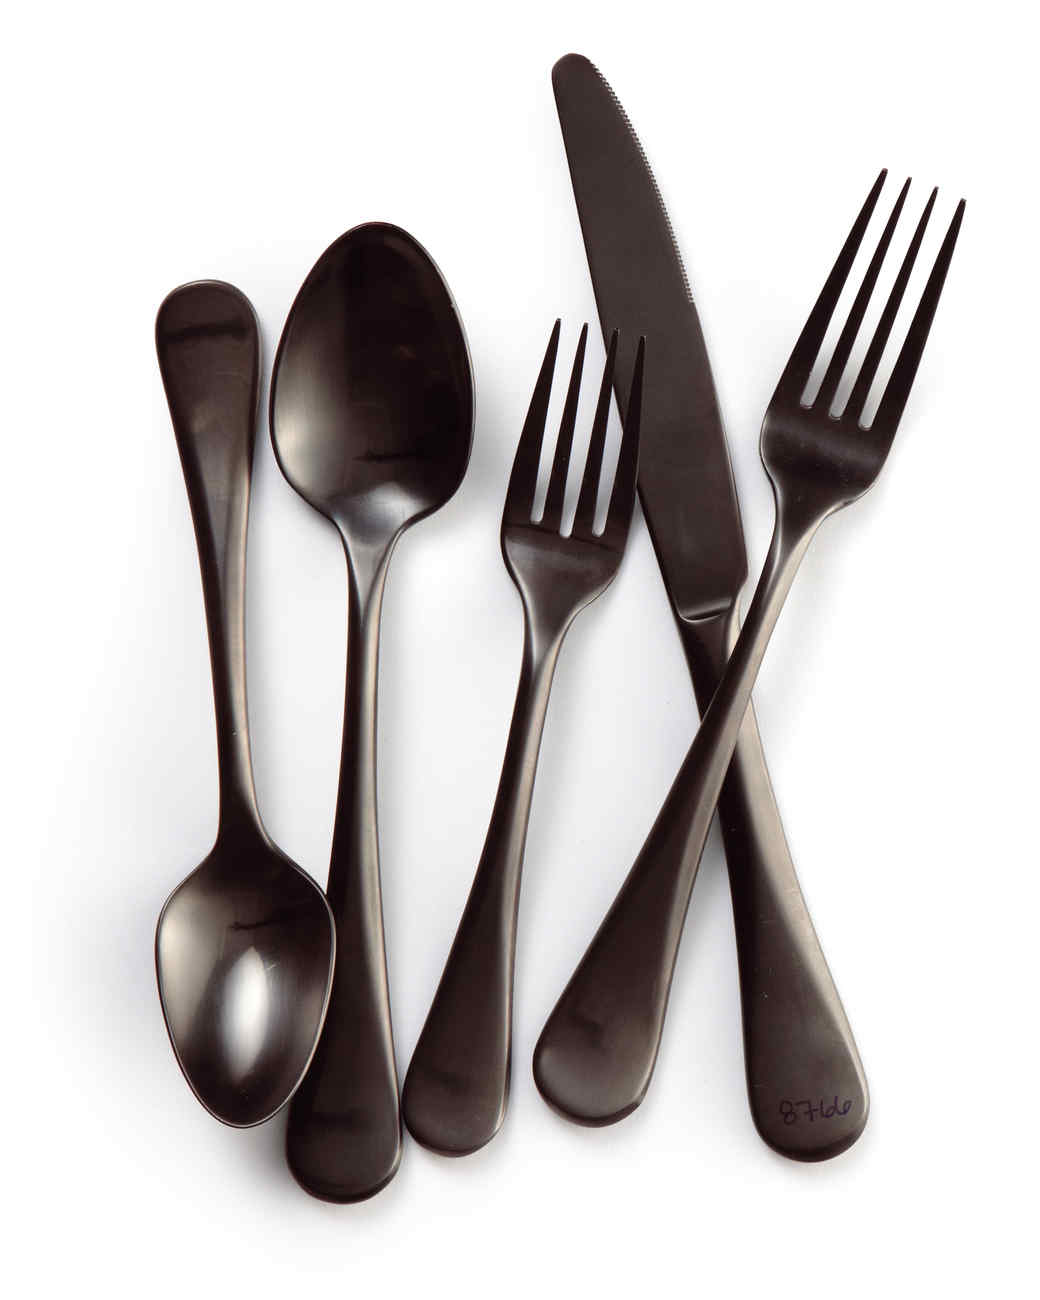 silverware-024-mld110351.jpg